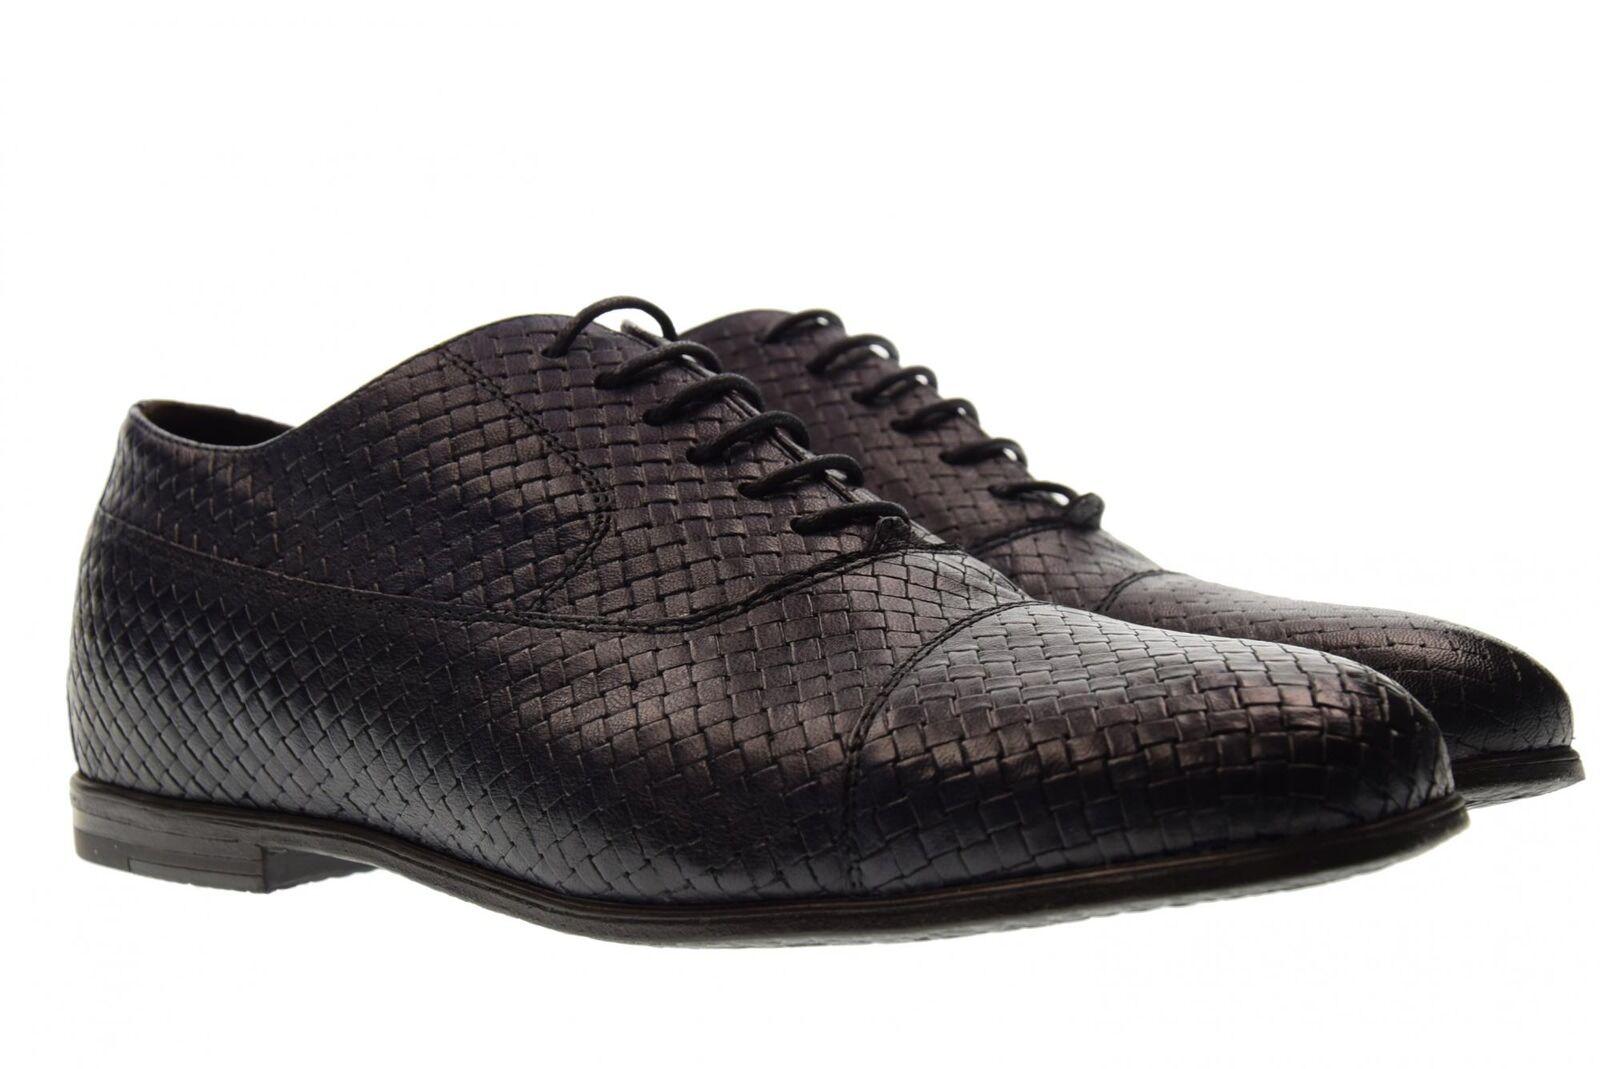 Igi&Co BLU scarpe uomo classiche 1102511 BLU Igi&Co P18 c7c282